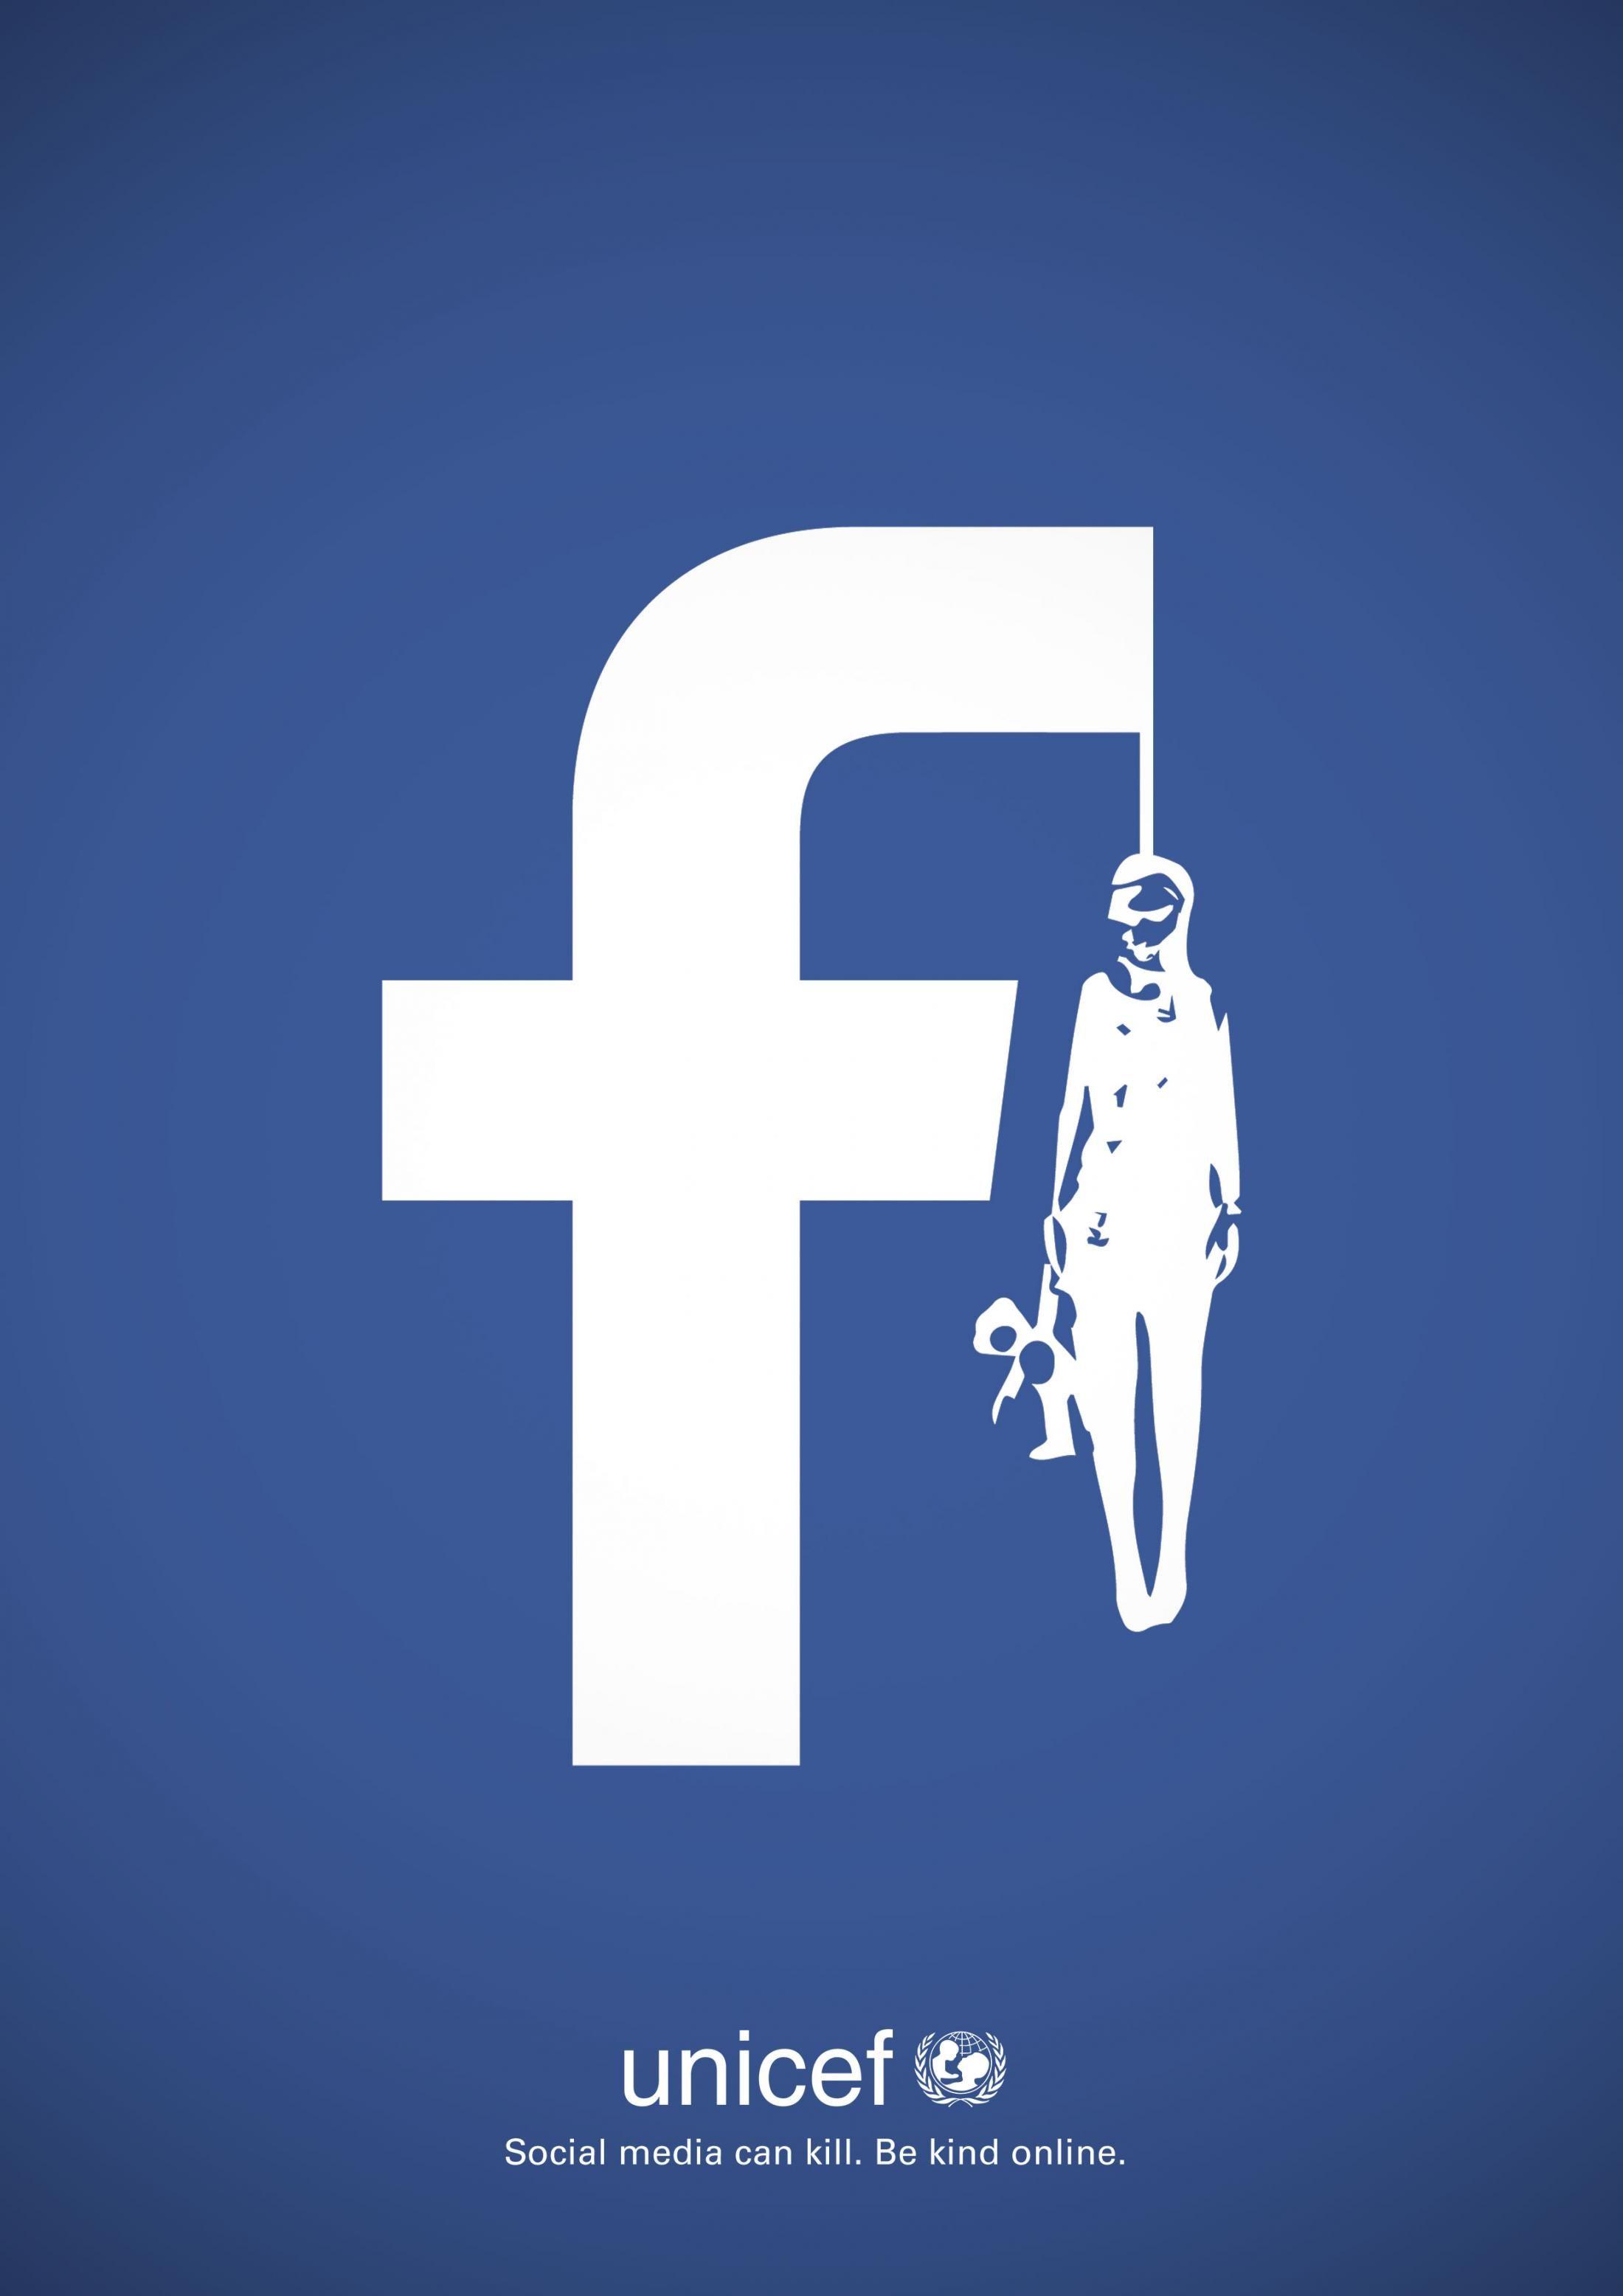 Unicef - Facebook Can Kill Social media can kill. Be kind ...